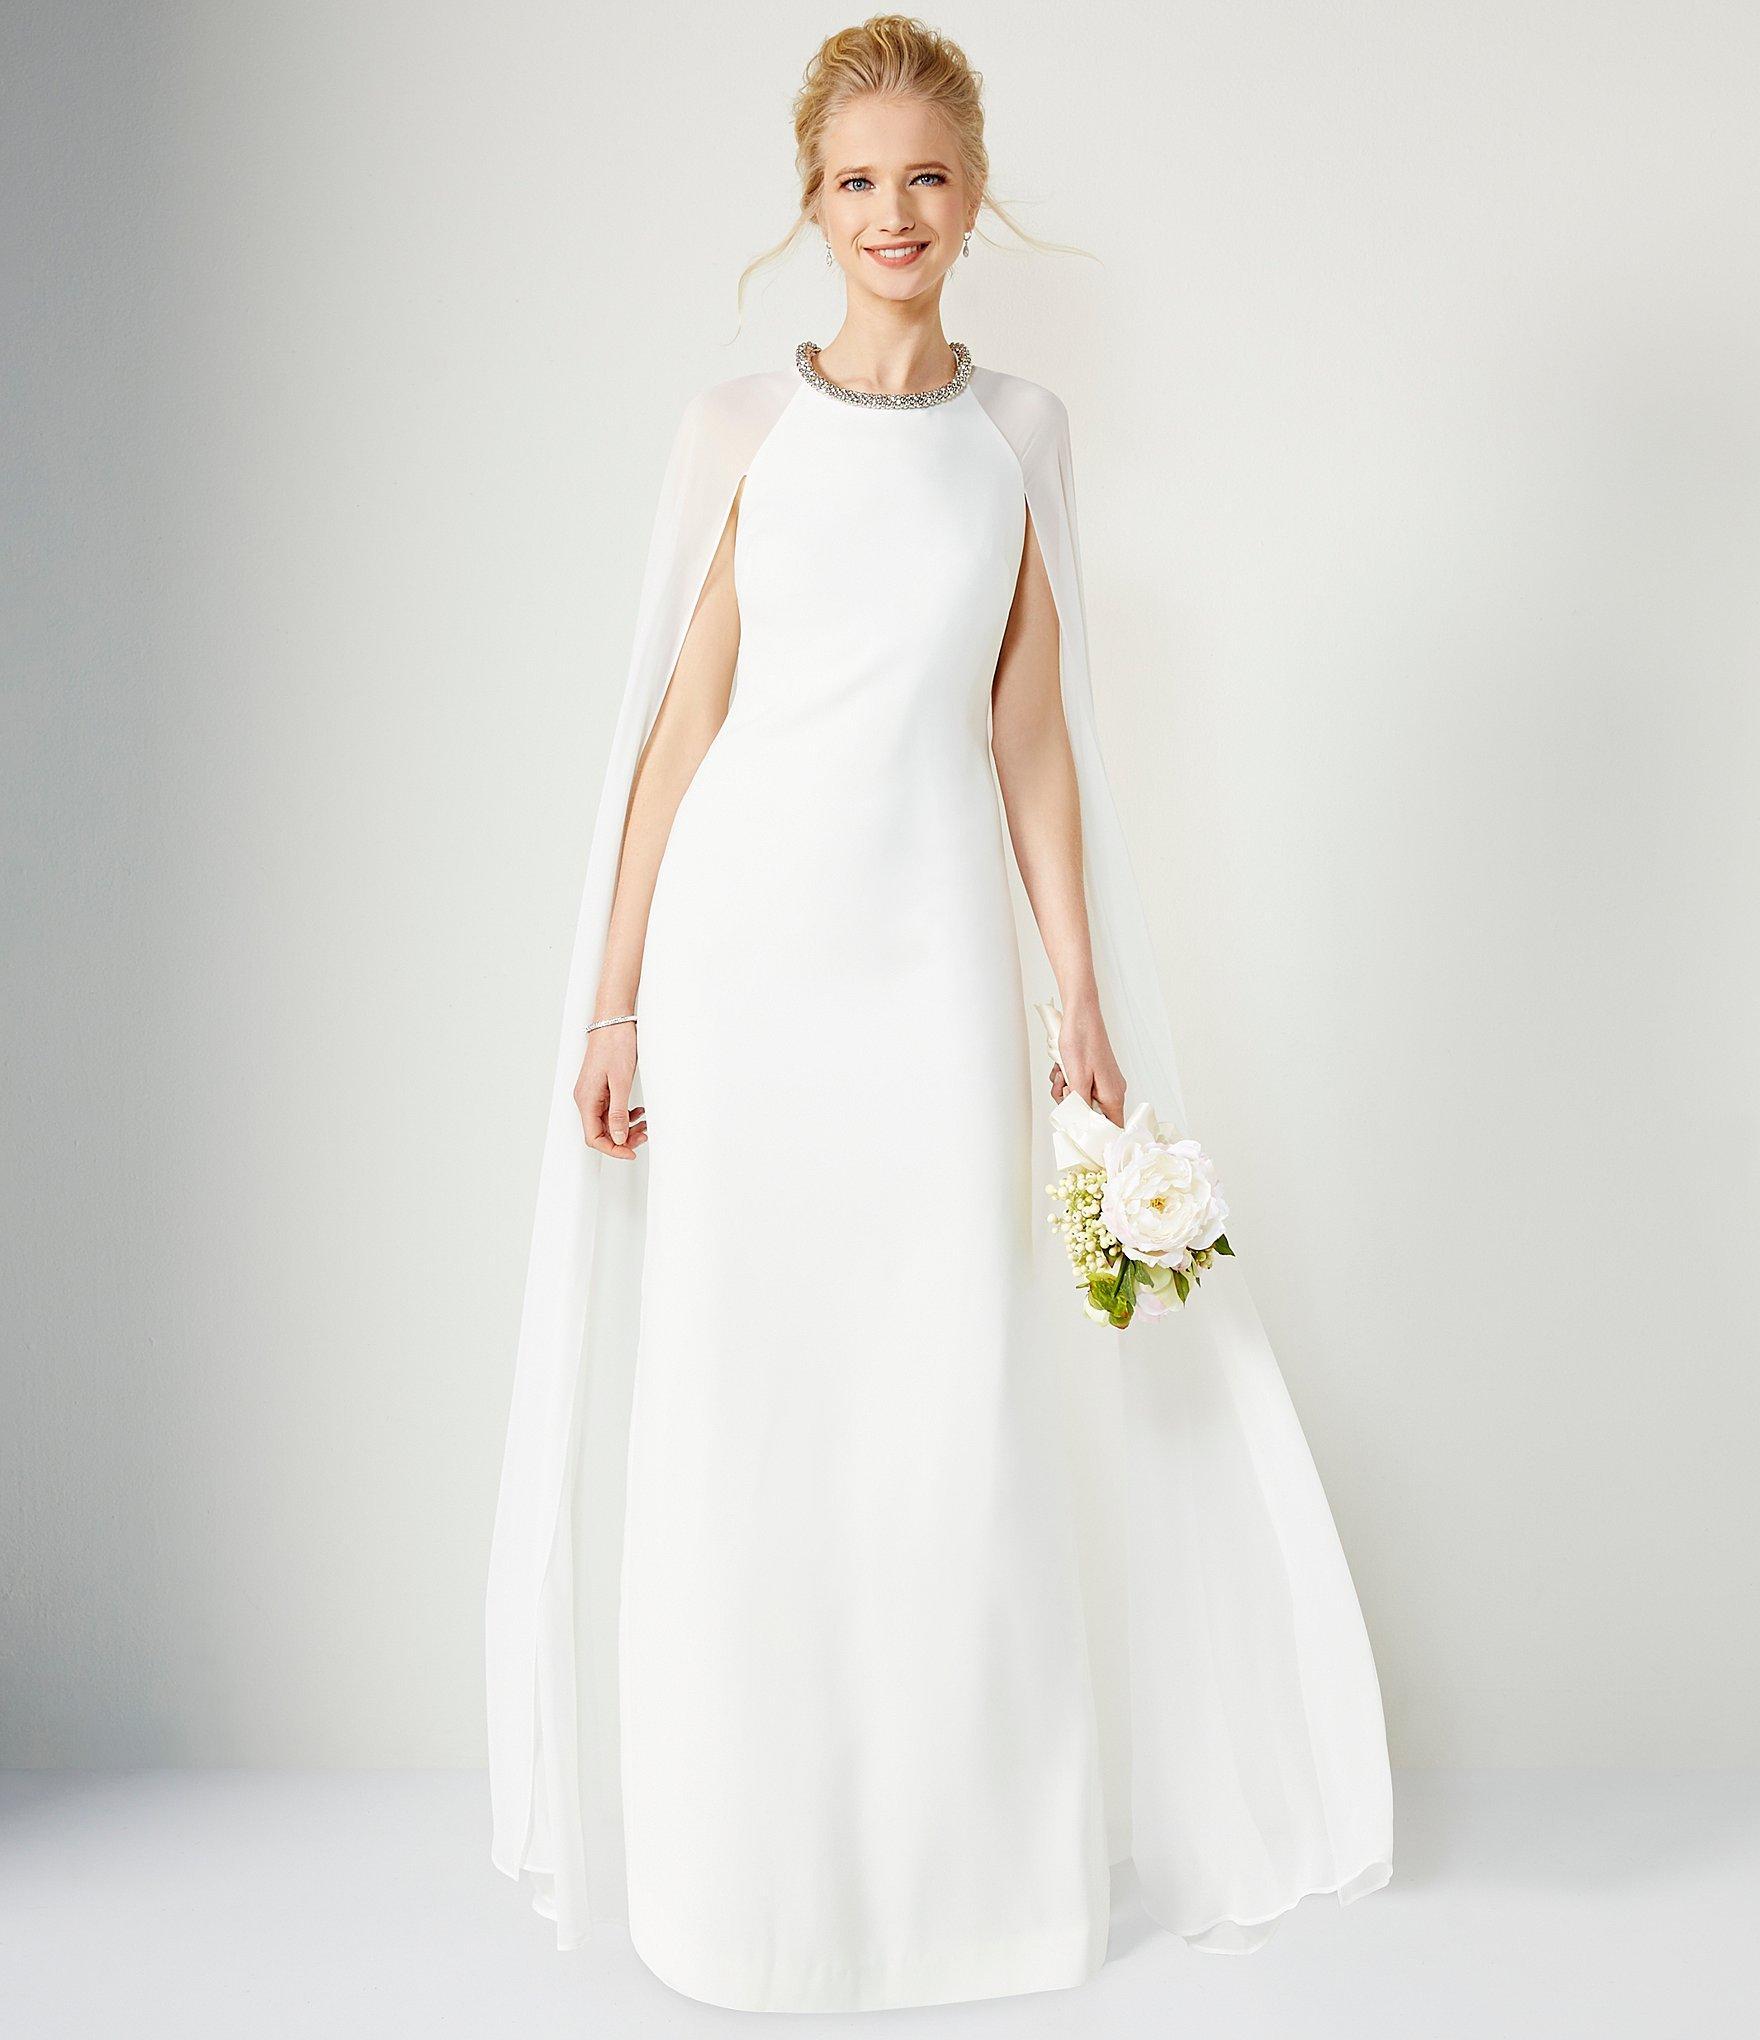 f5de7fadd63c Lyst - Calvin Klein Beaded-neck Chiffon Cape Gown in White